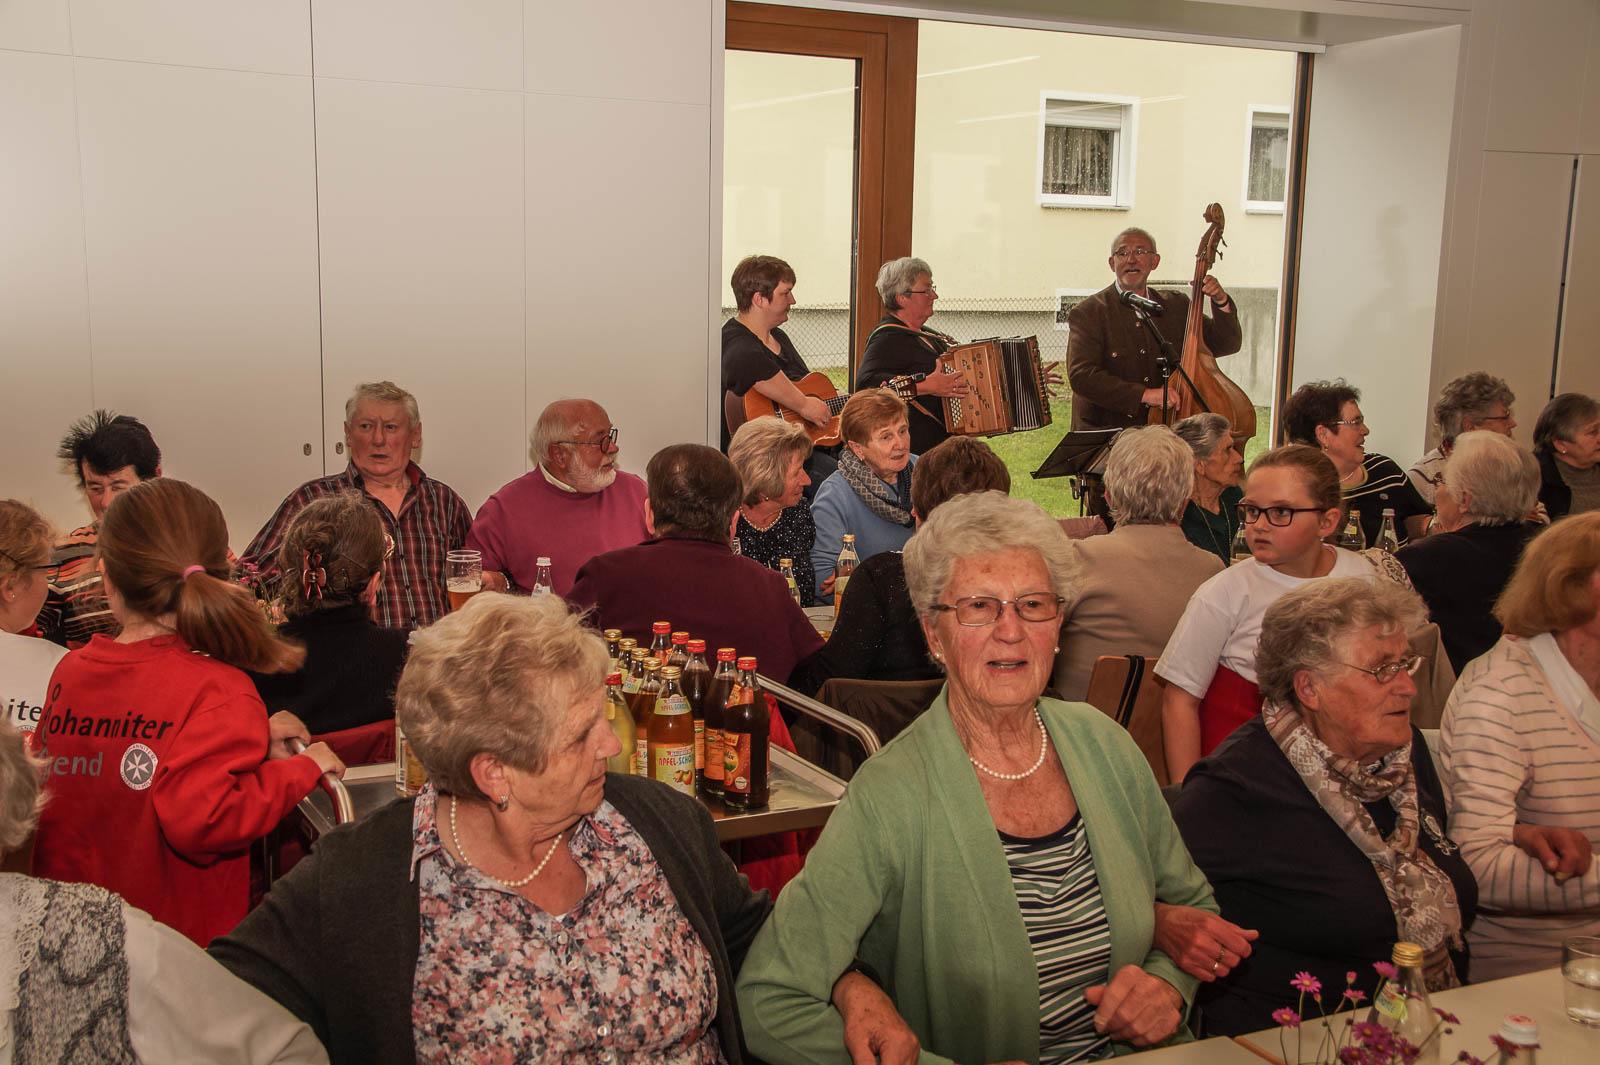 20190504-Seniorennachmittag Johanniter Pfarrheim SF_DSC04189